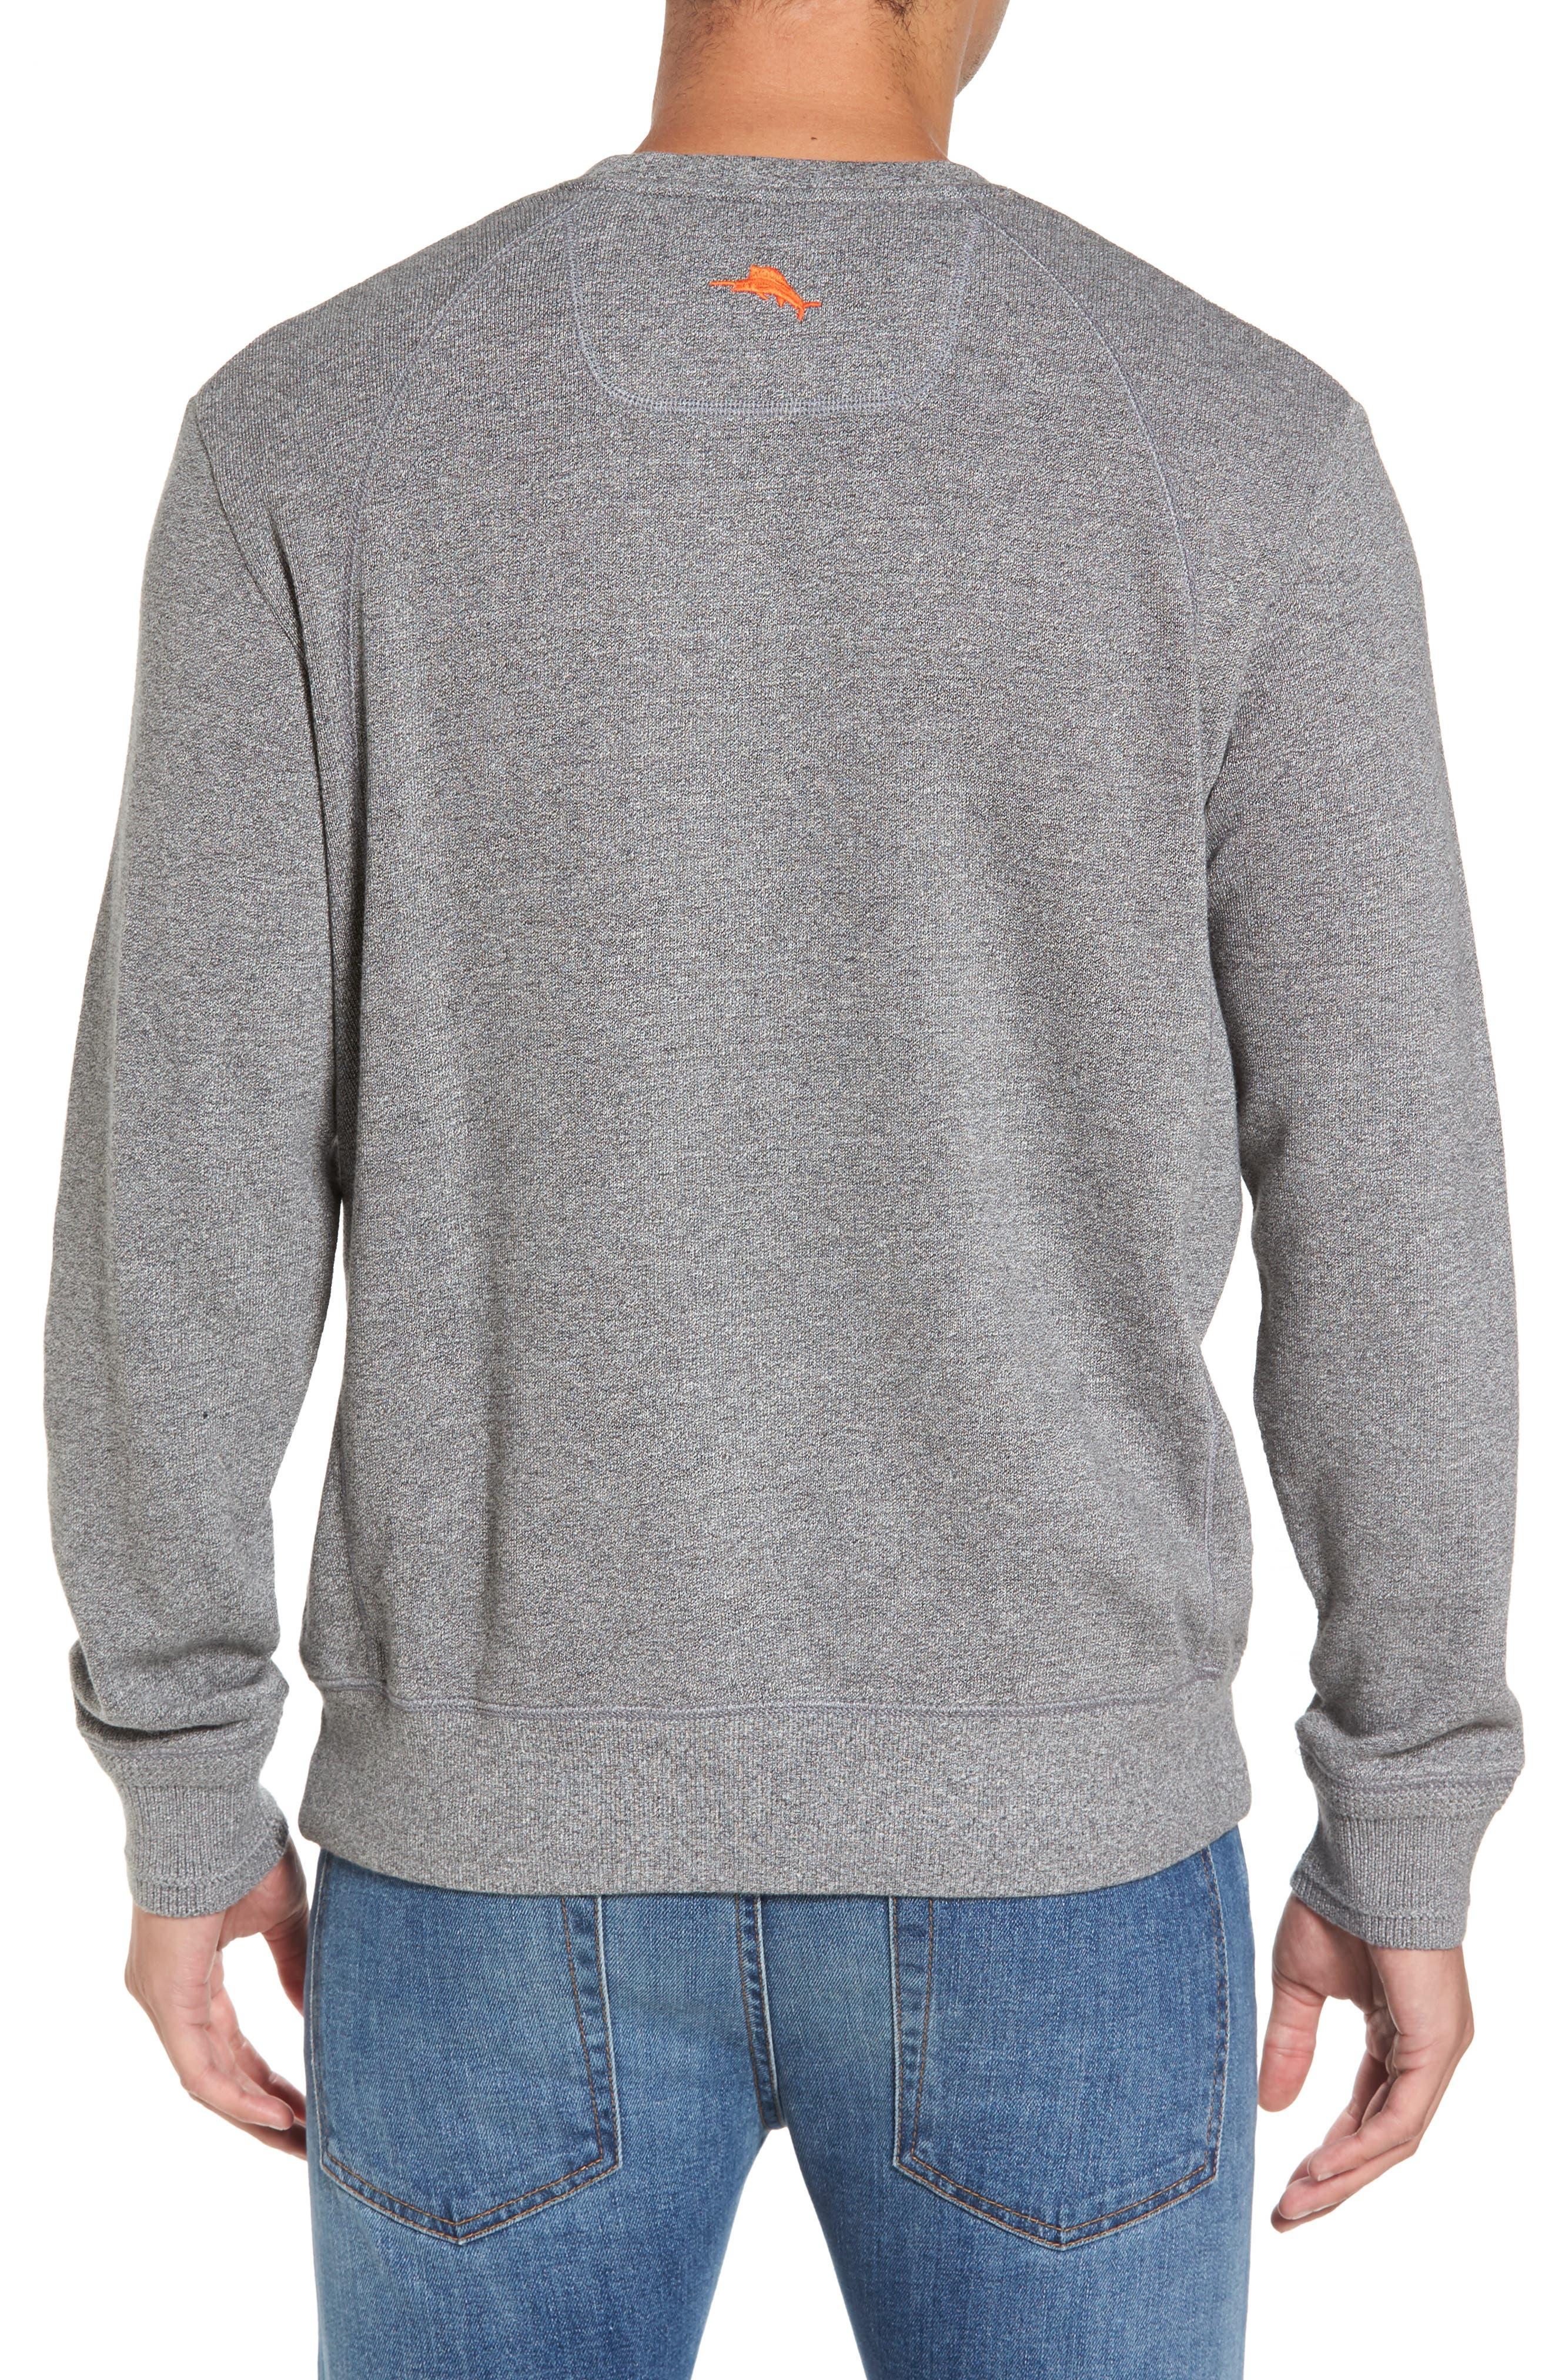 NFL Stitch of Liberty Embroidered Crewneck Sweatshirt,                             Alternate thumbnail 38, color,